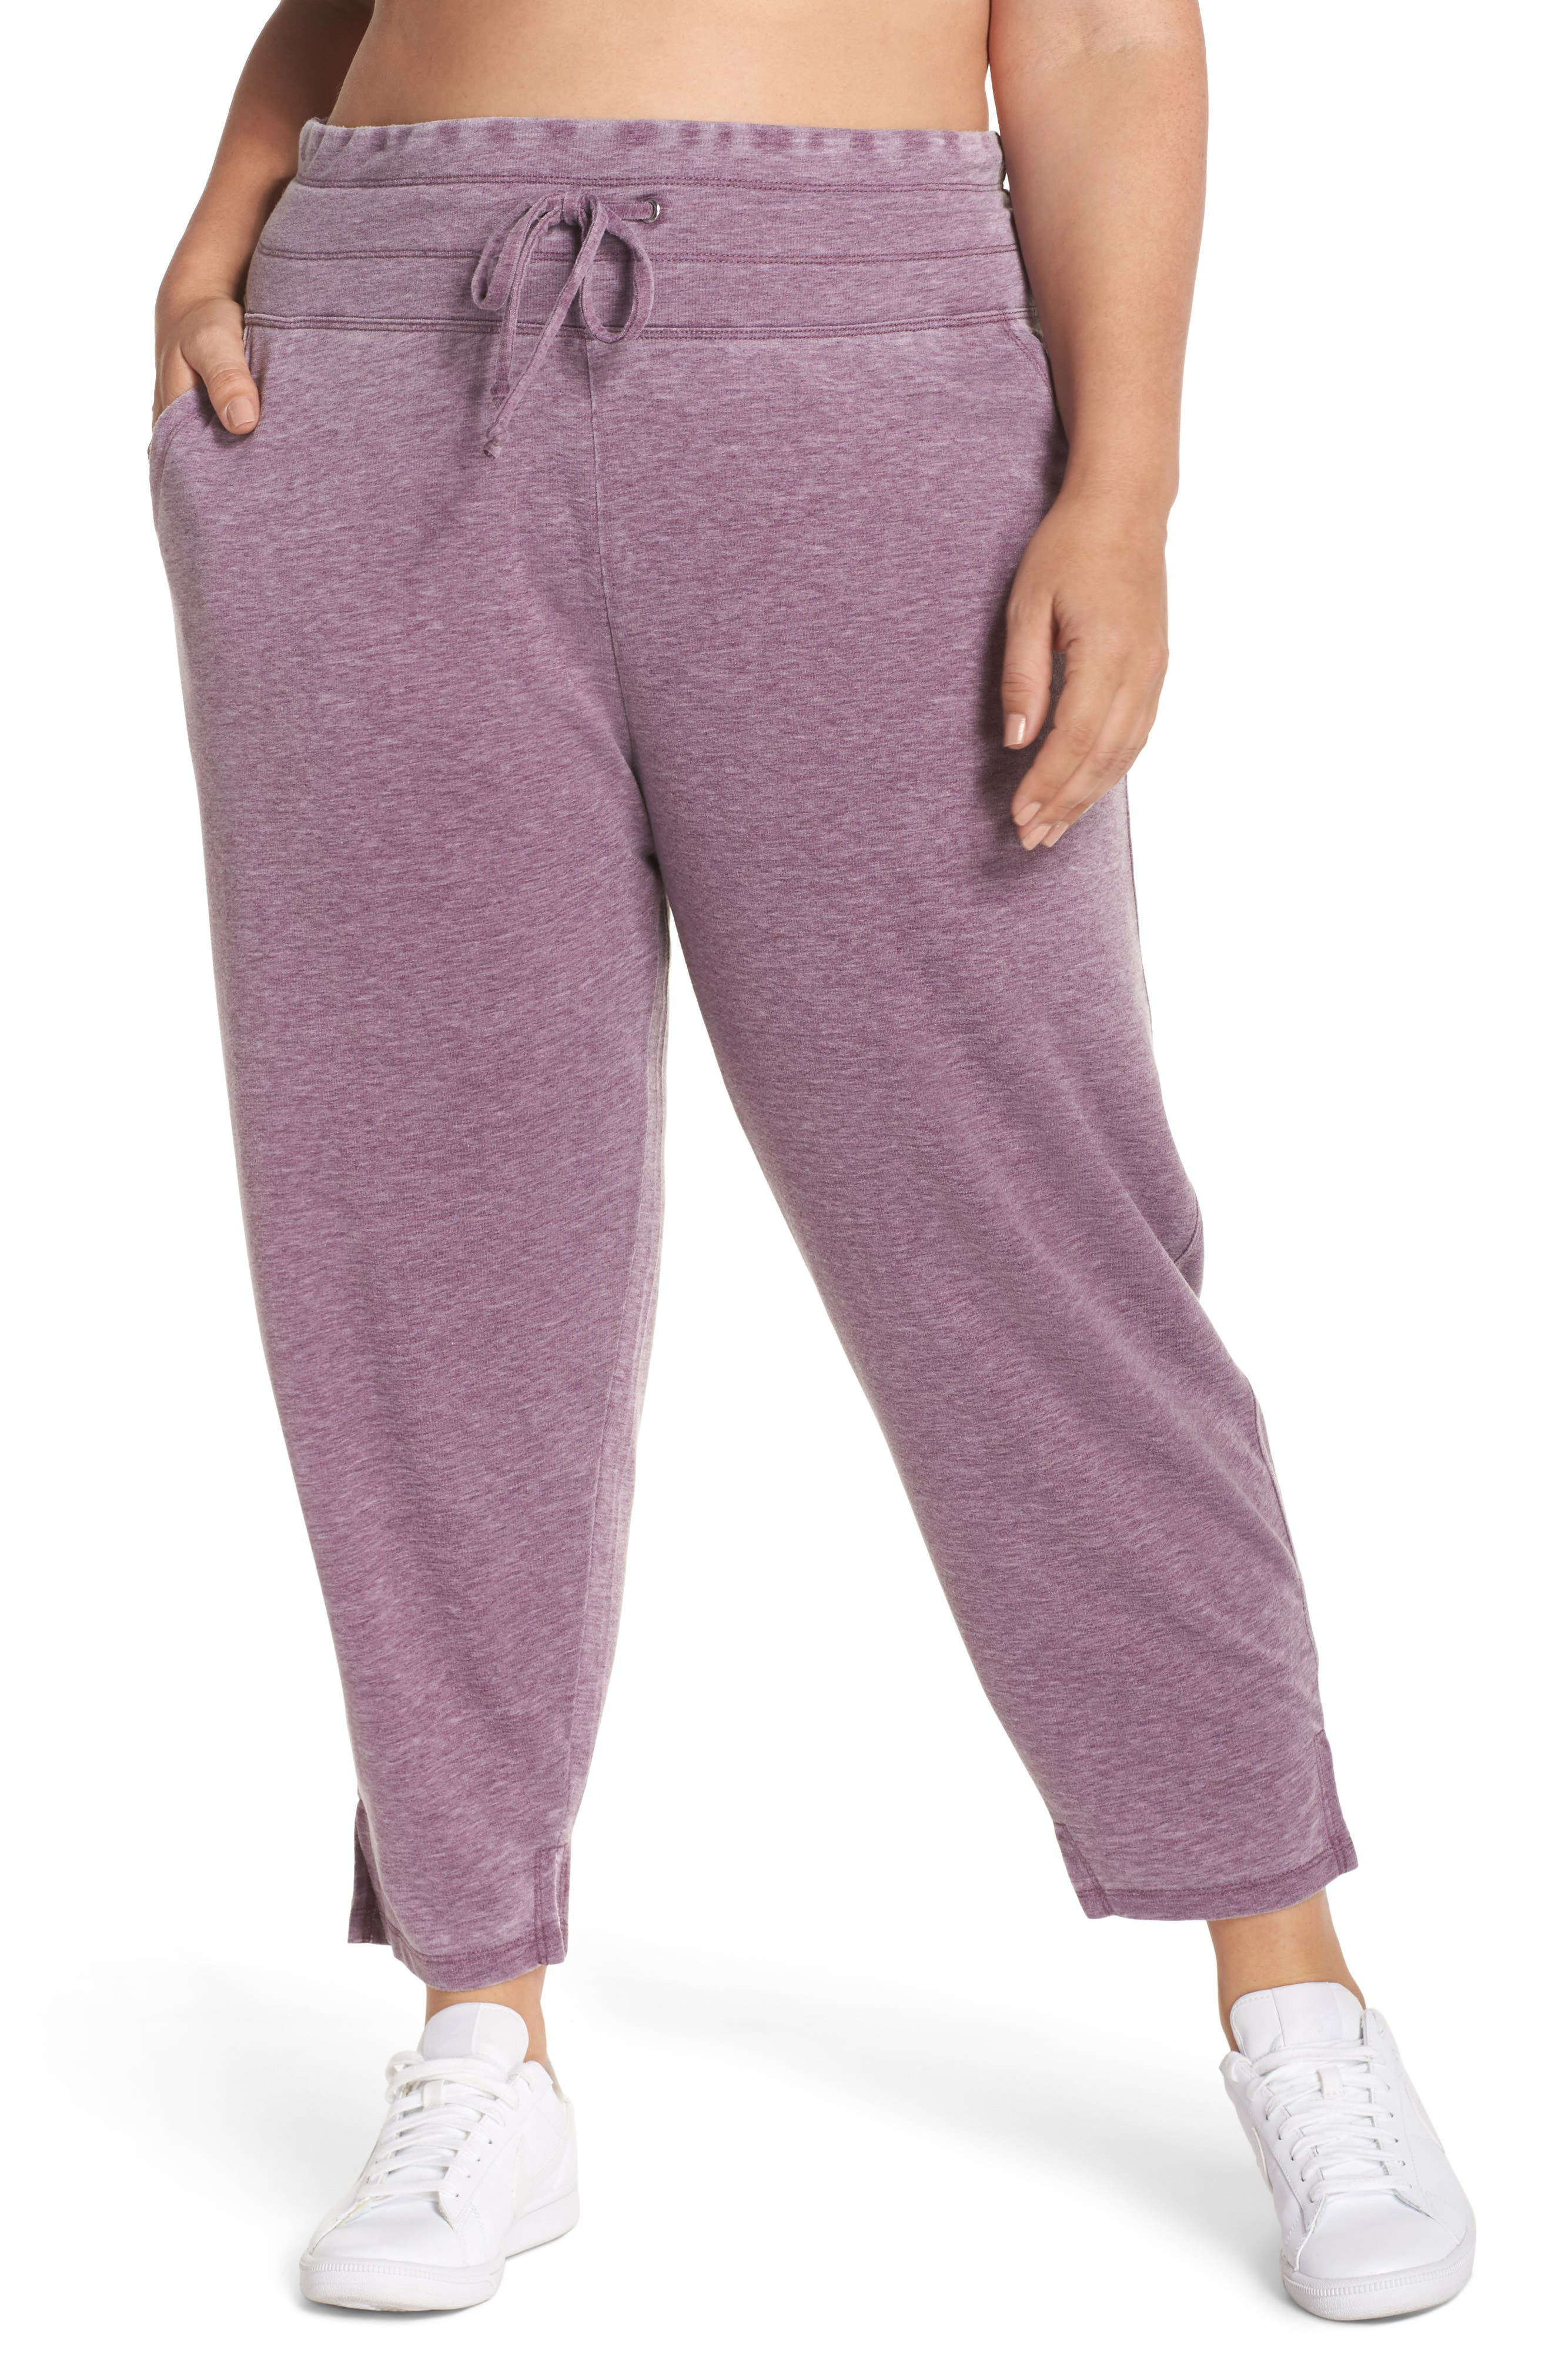 Kayle Crop Sweatpants,                             Main thumbnail 1, color,                             Aubergine Glow